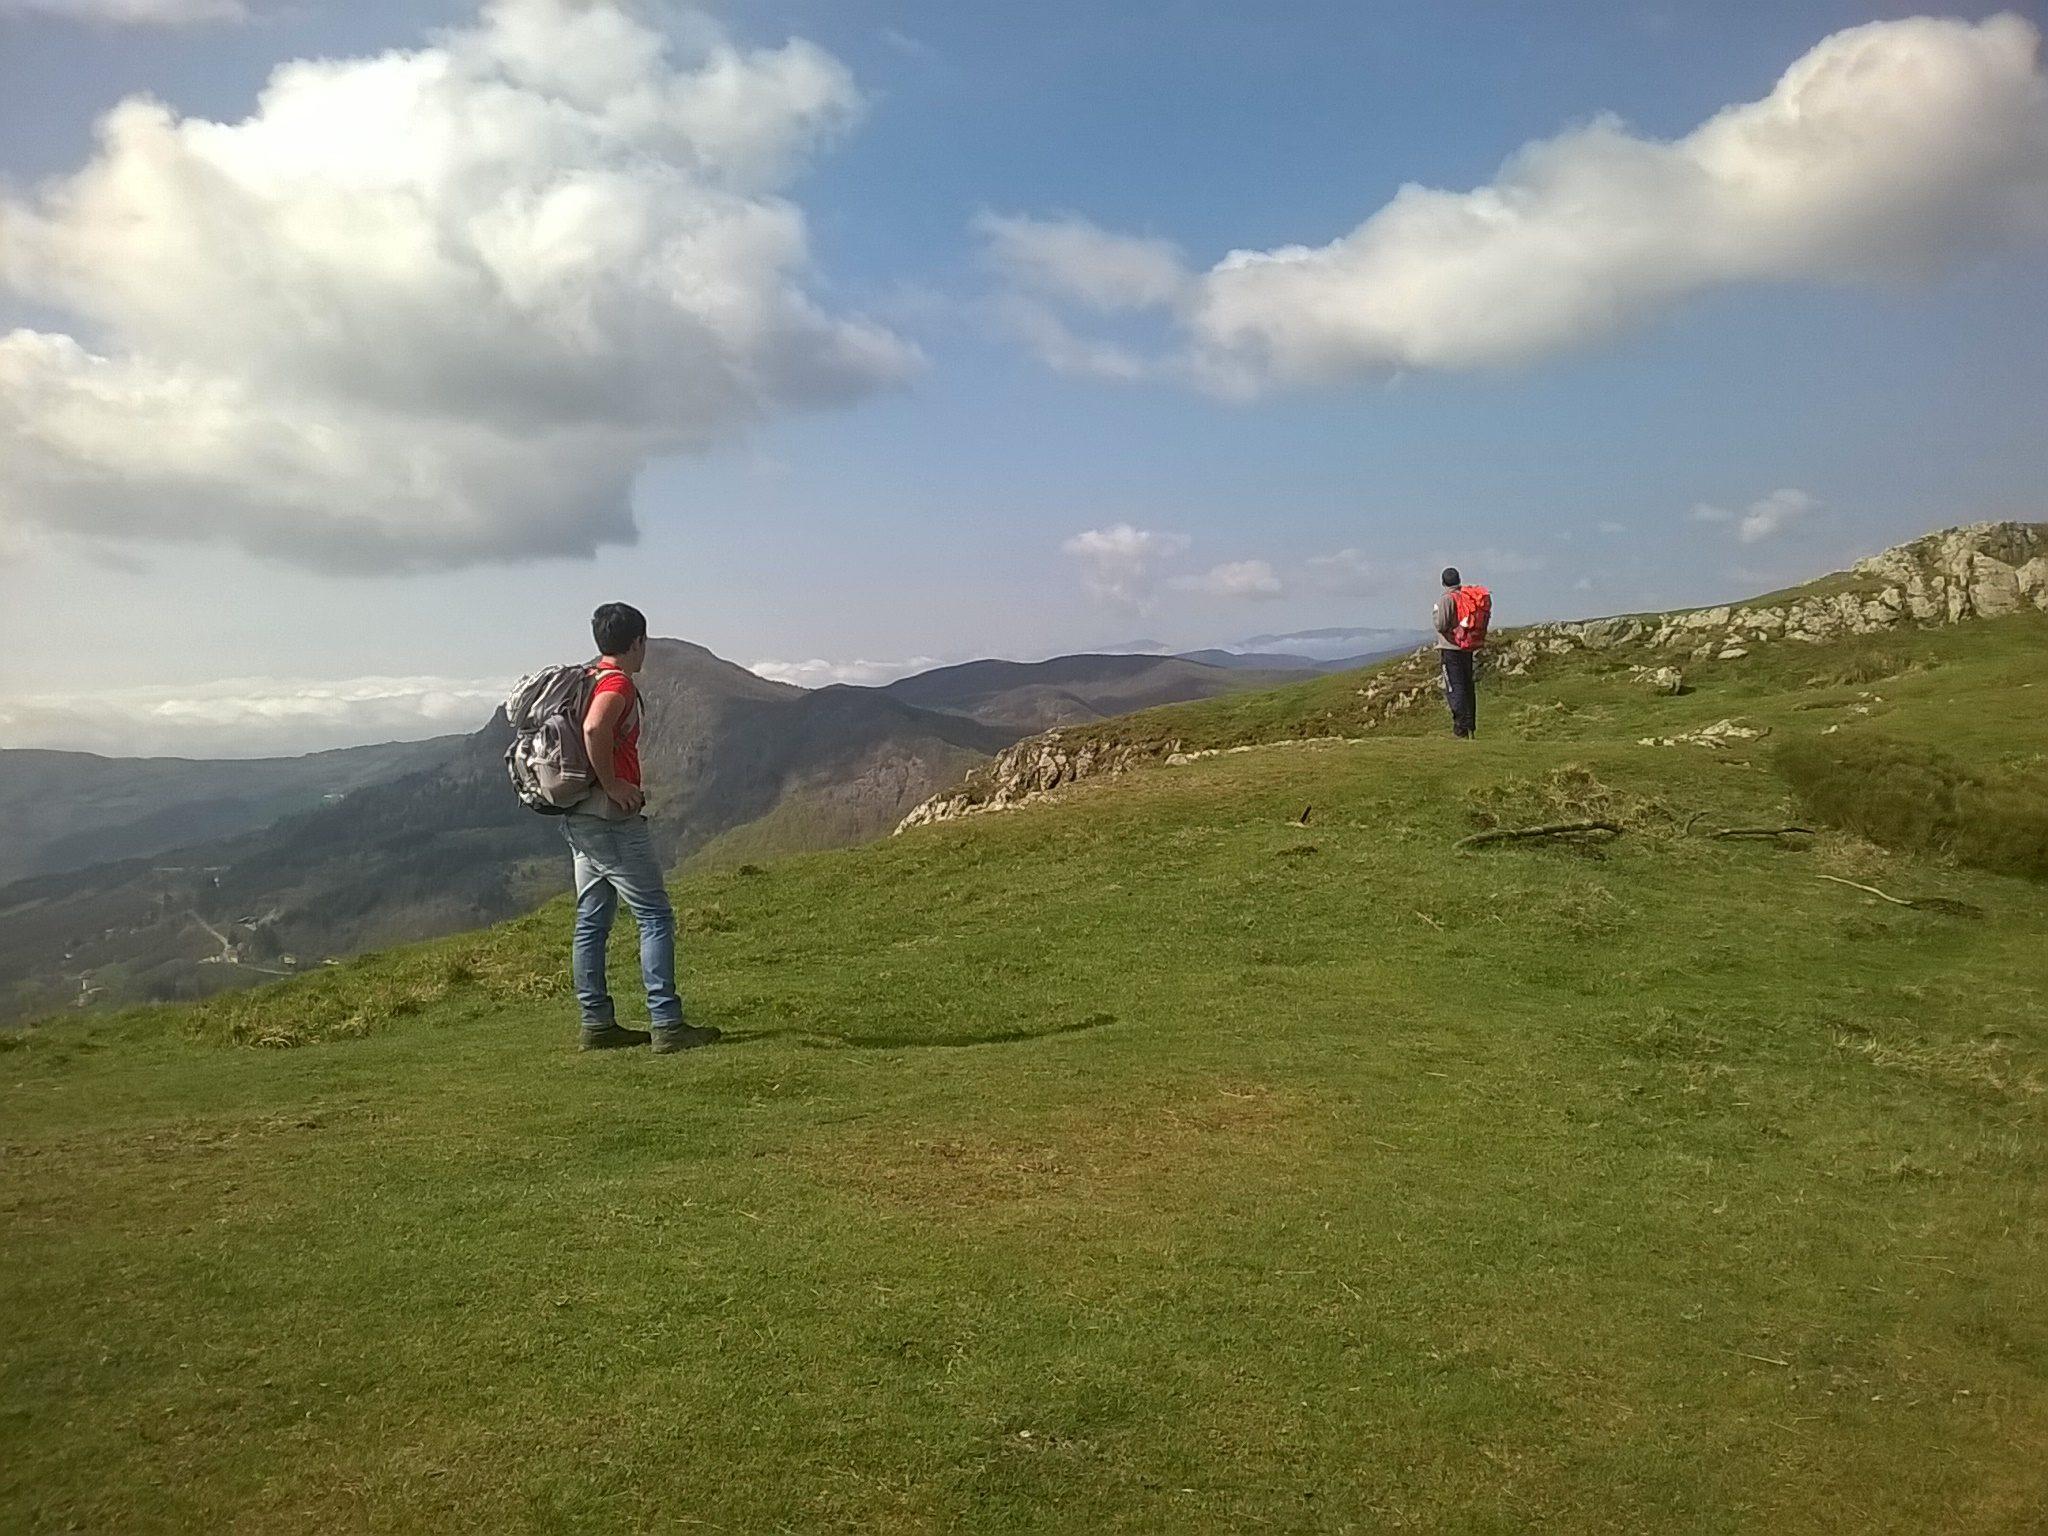 Monte Beni e Alto Savena